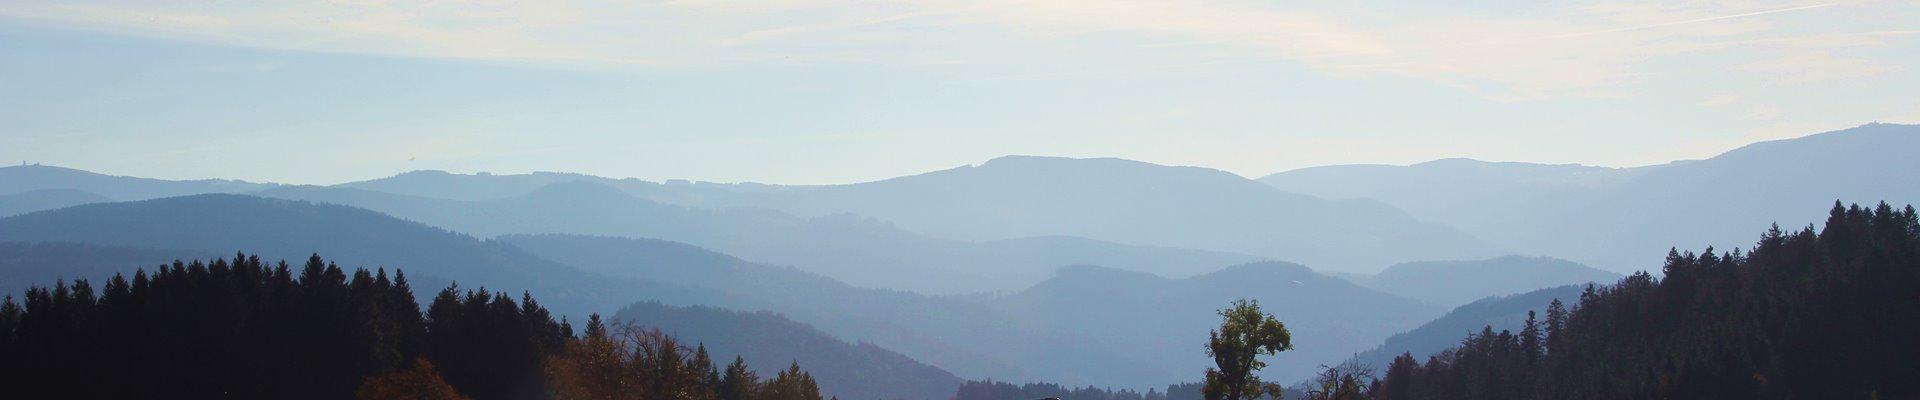 Griesbachhof Slider: Bergprofil nahe St. Märgen